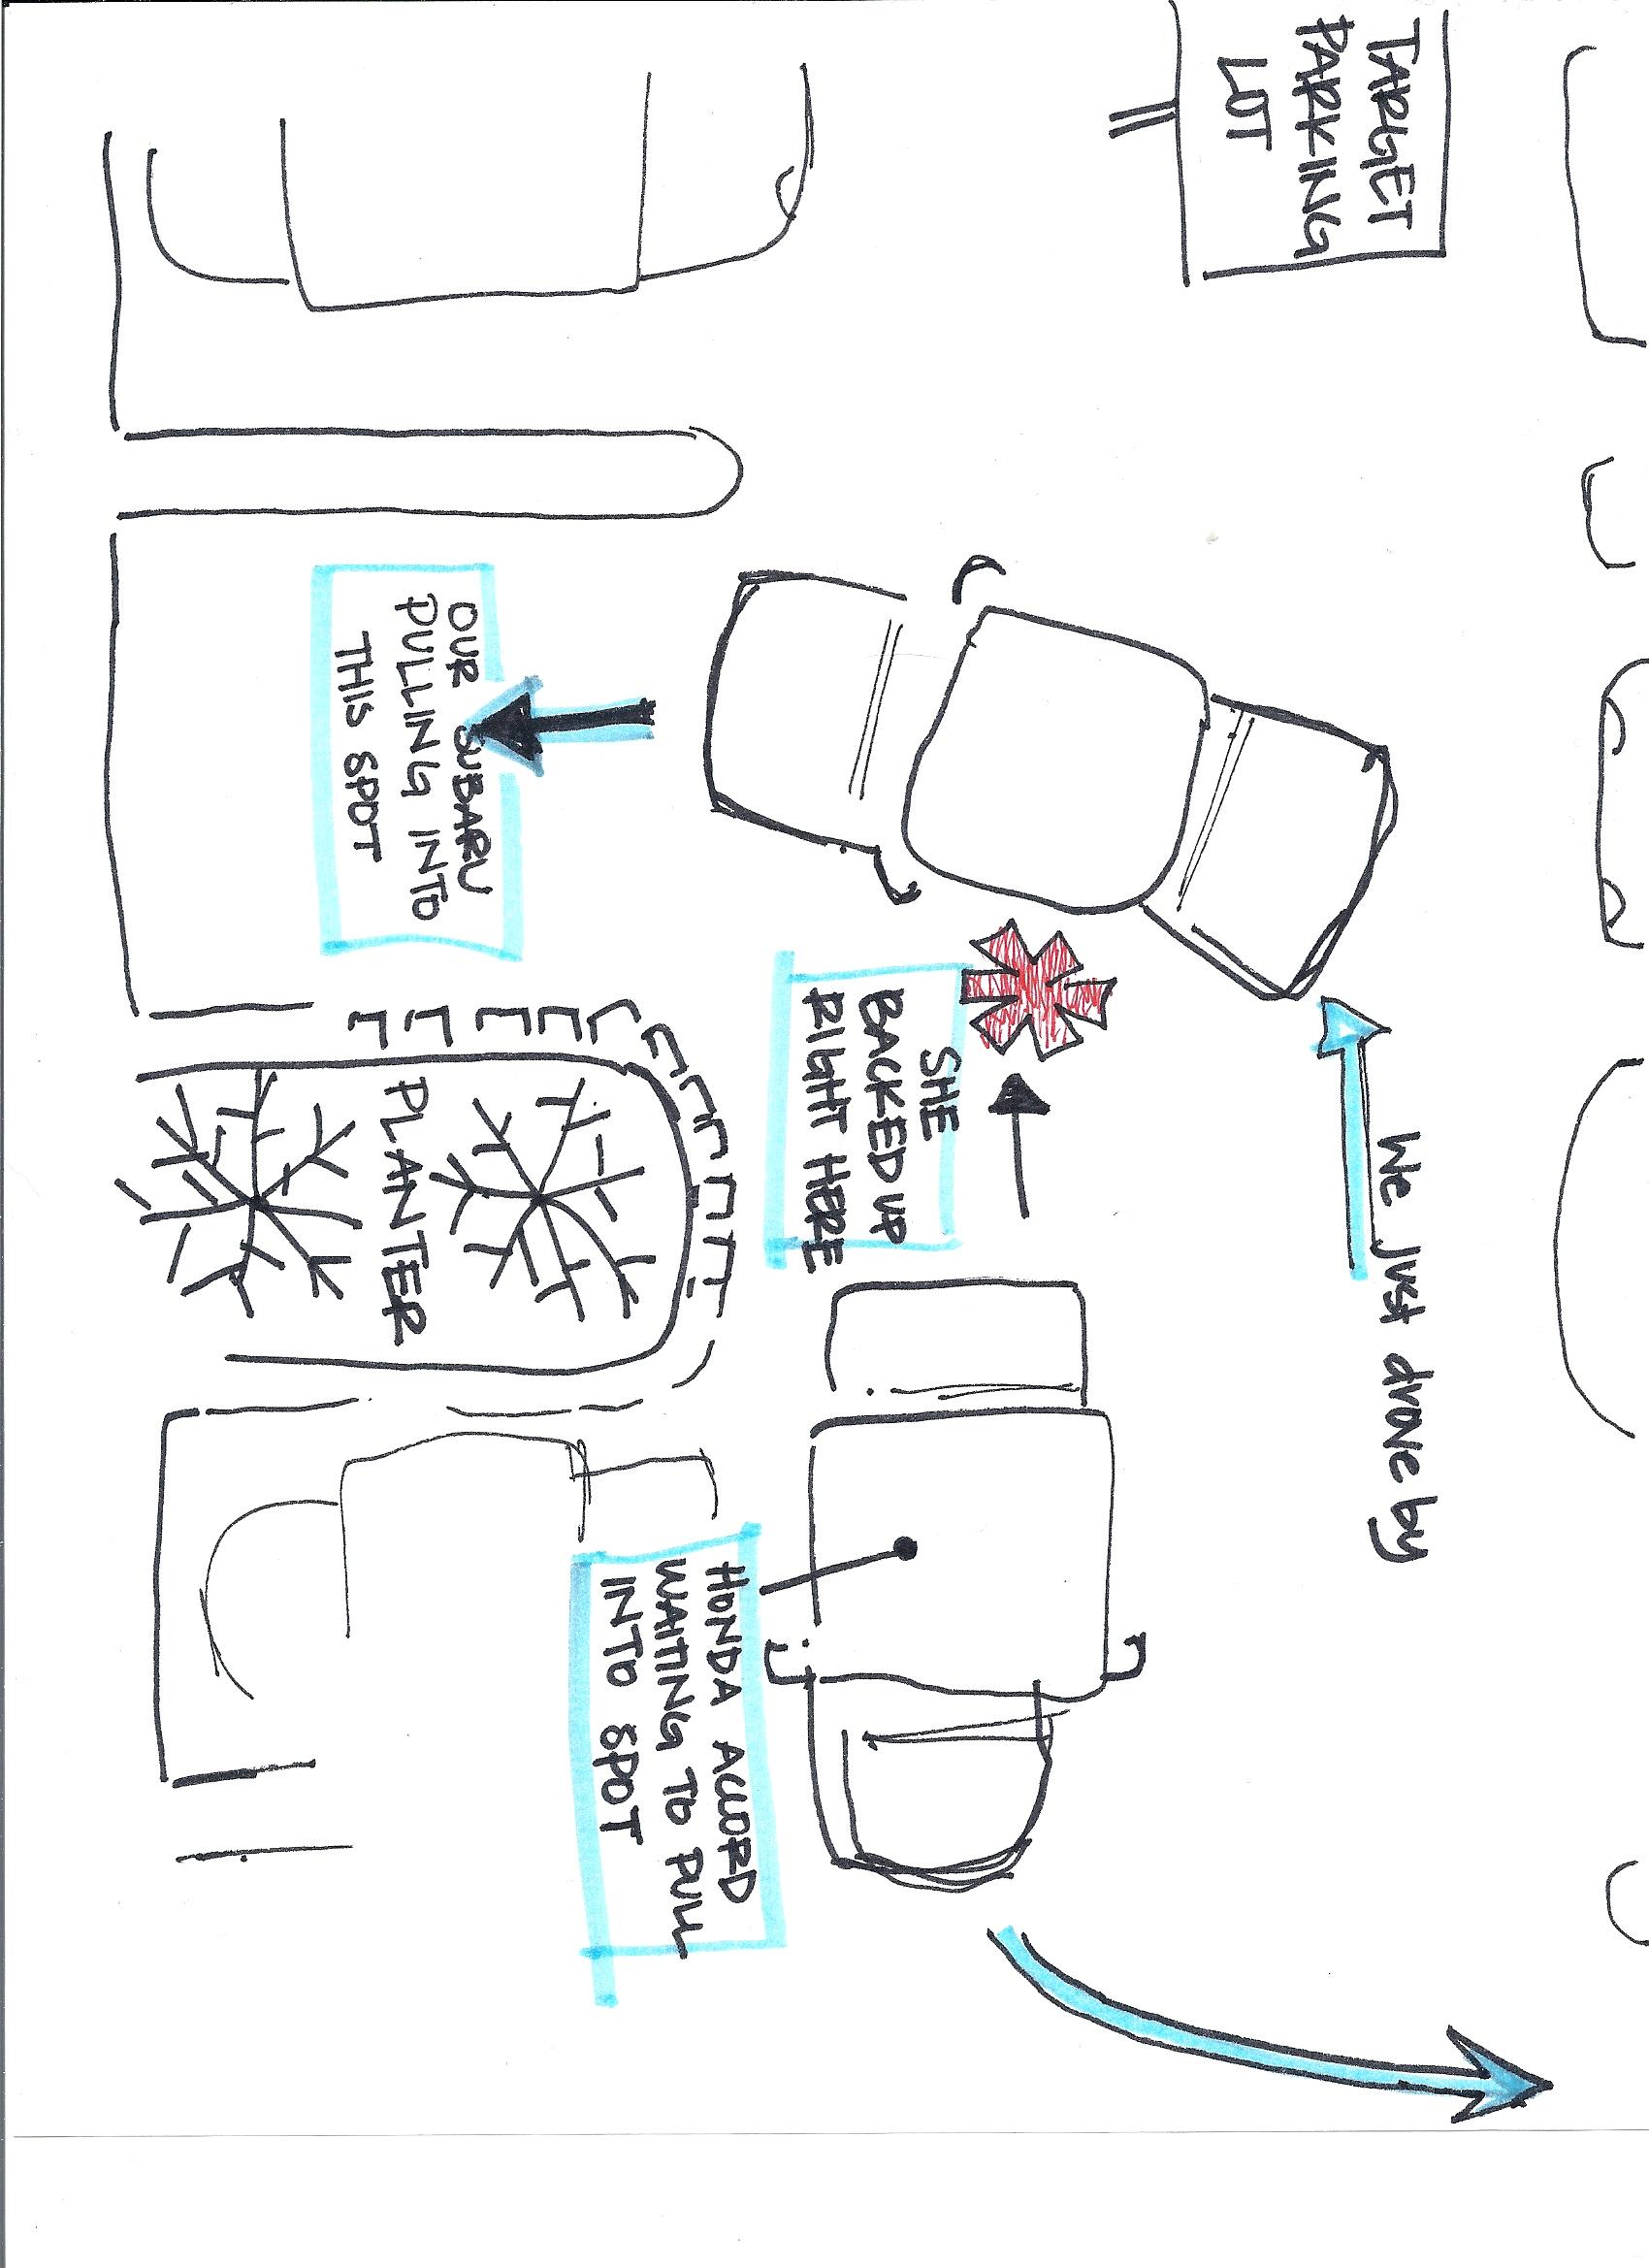 car accident car accident diagram template